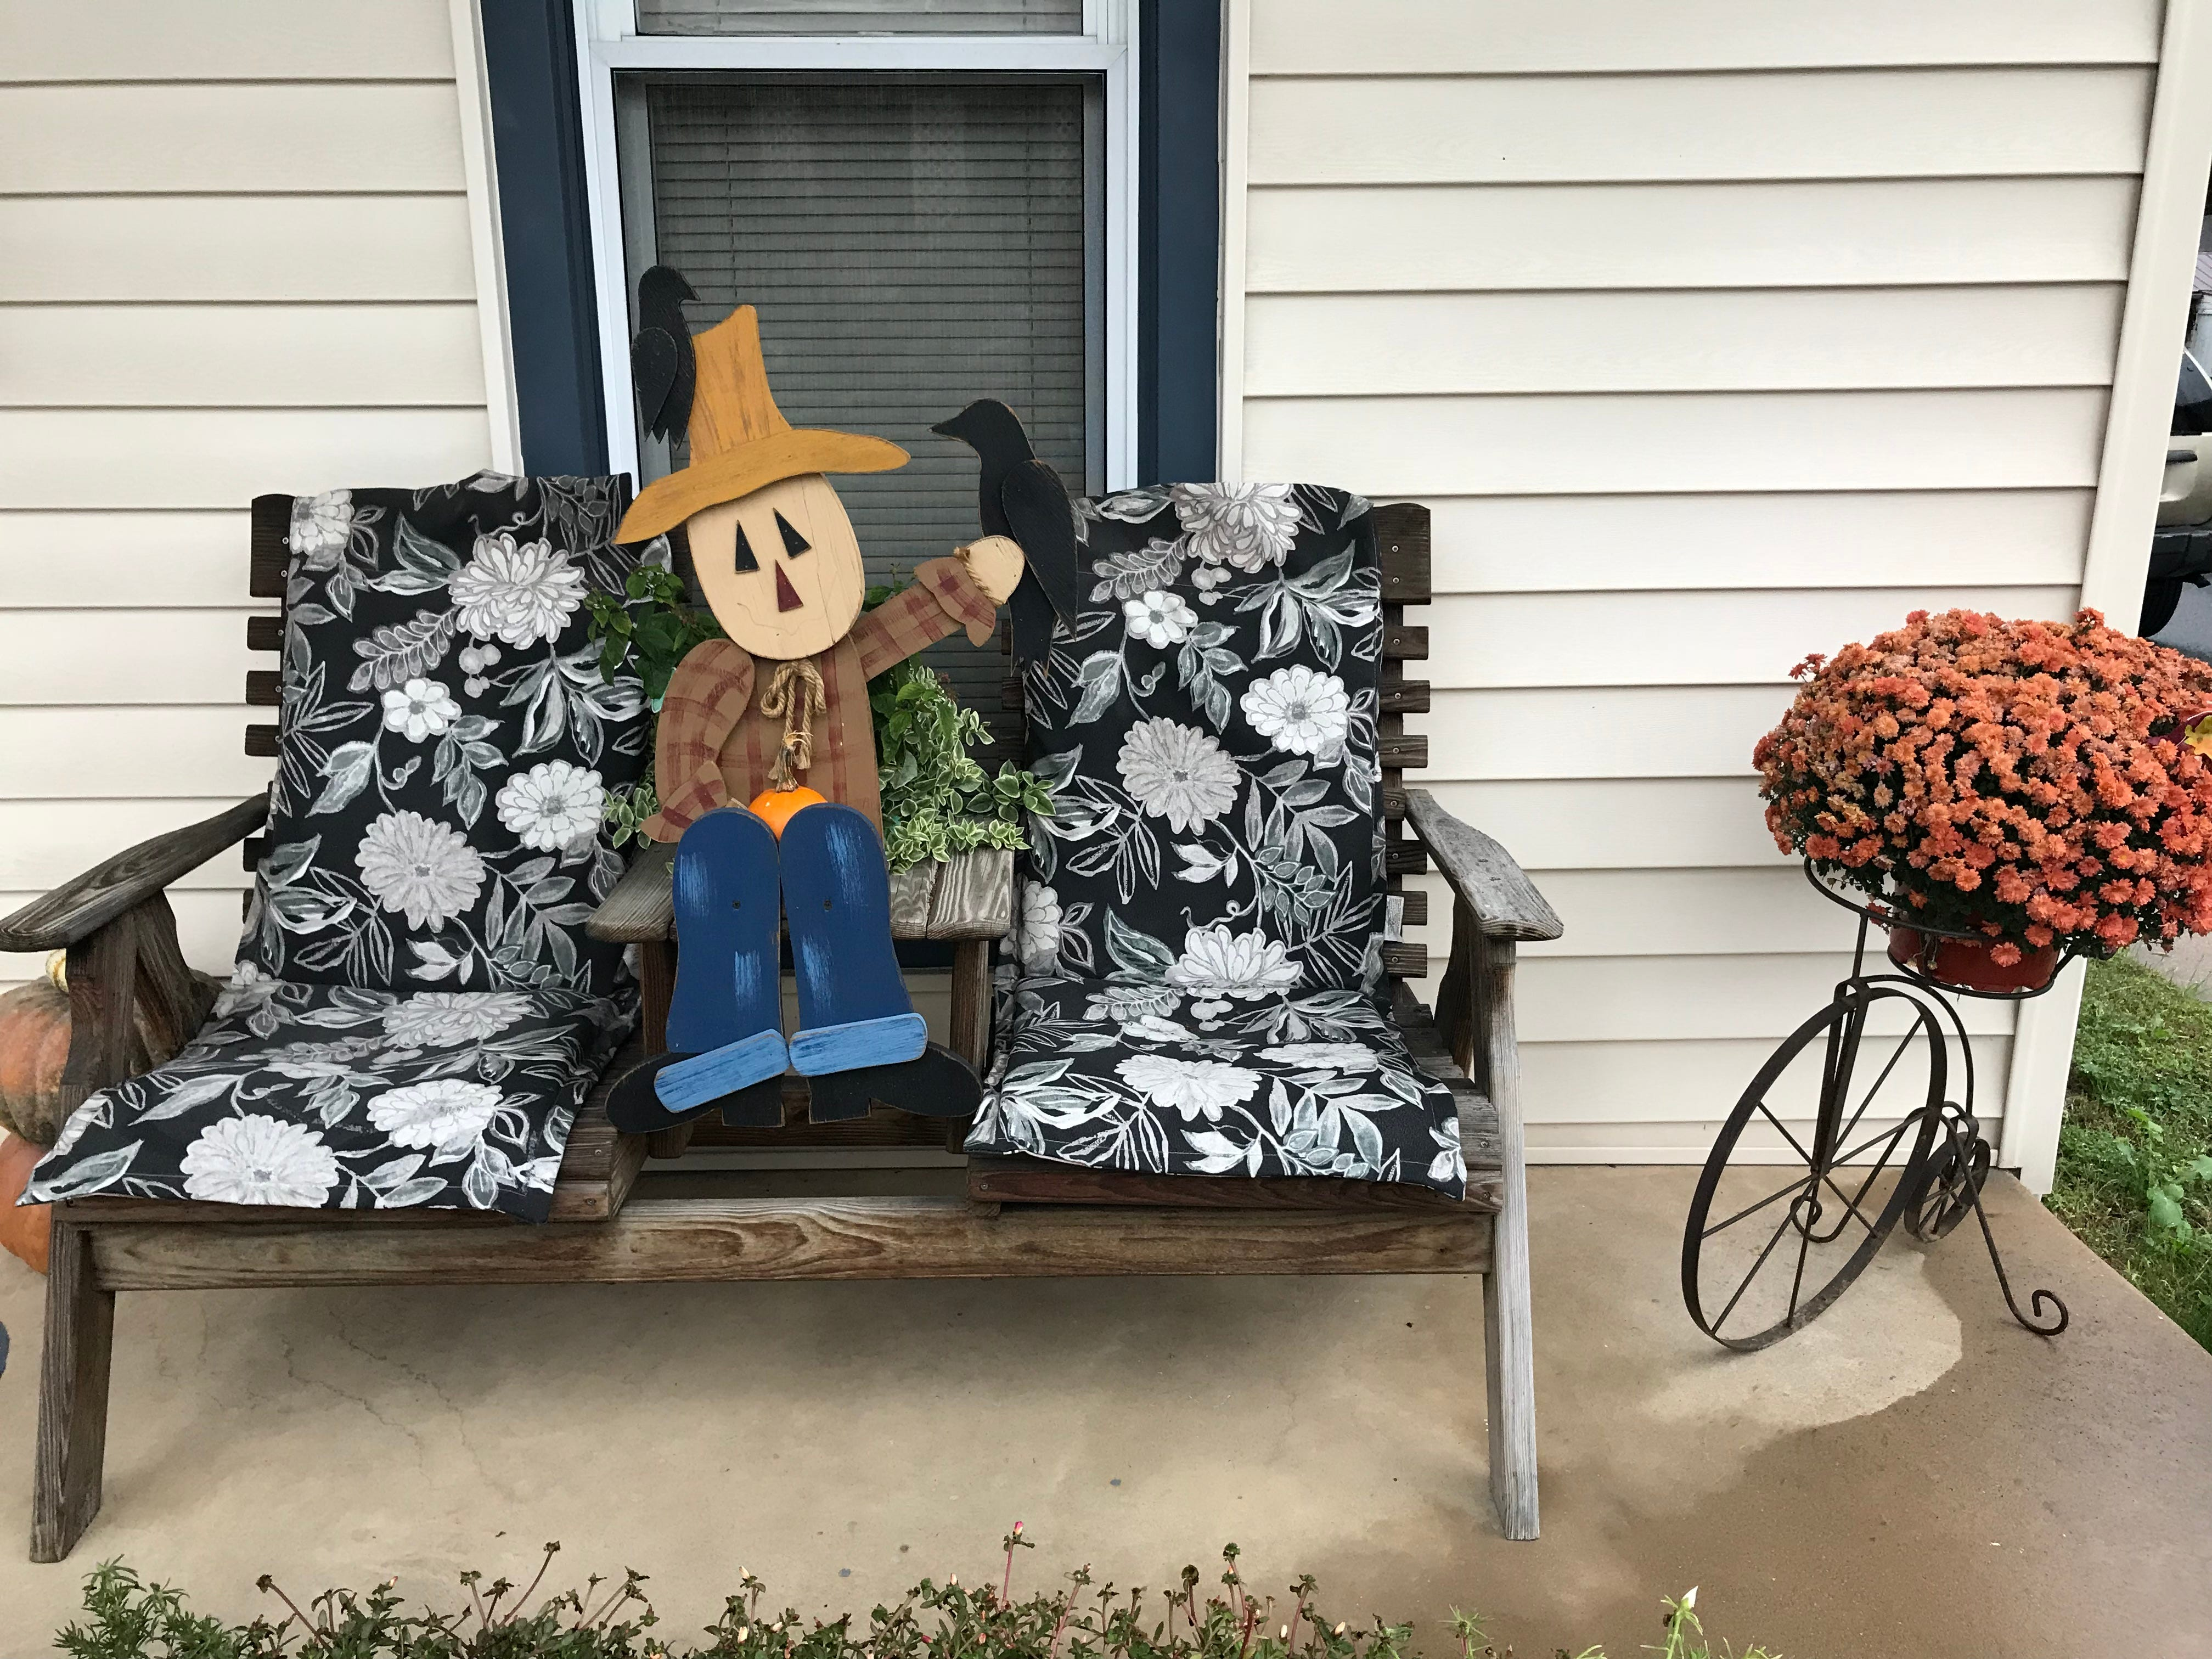 A scarecrow decoration for the fall season at a residence on Fulton Street, Ephrata Borough, Lancaster County.